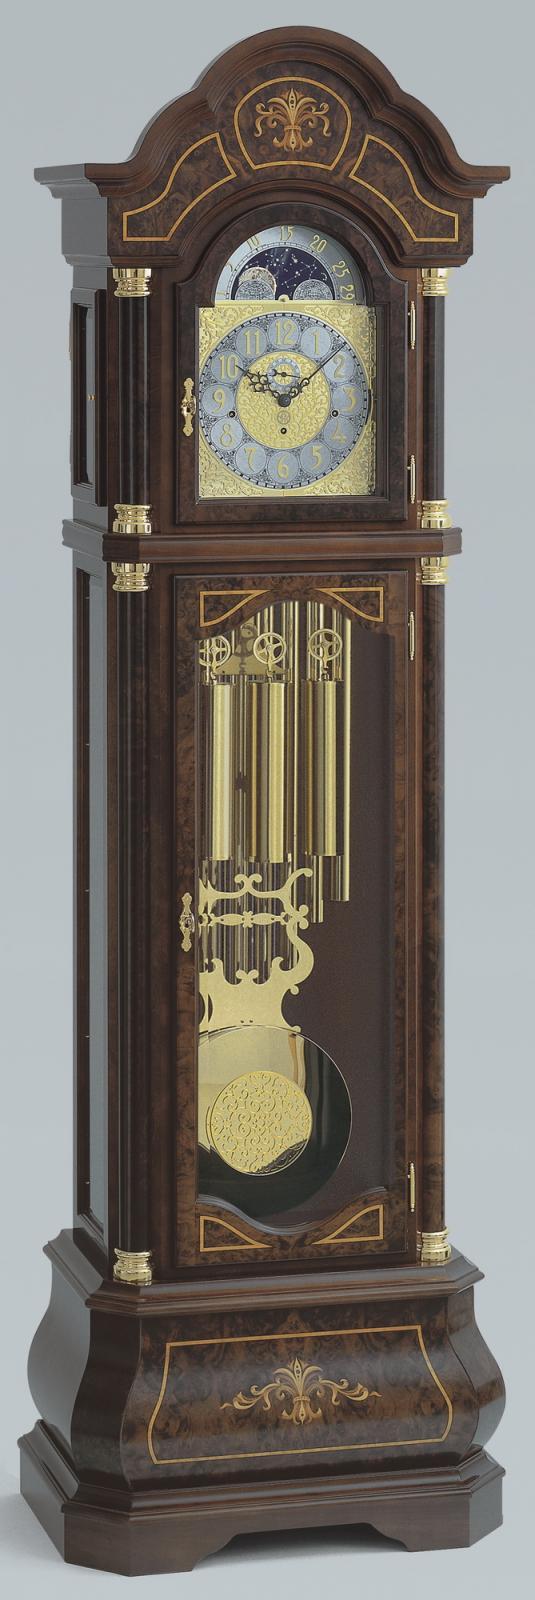 Found it at clockway kieninger floor clock made in germany found it at clockway kieninger floor clock made in germany amipublicfo Images